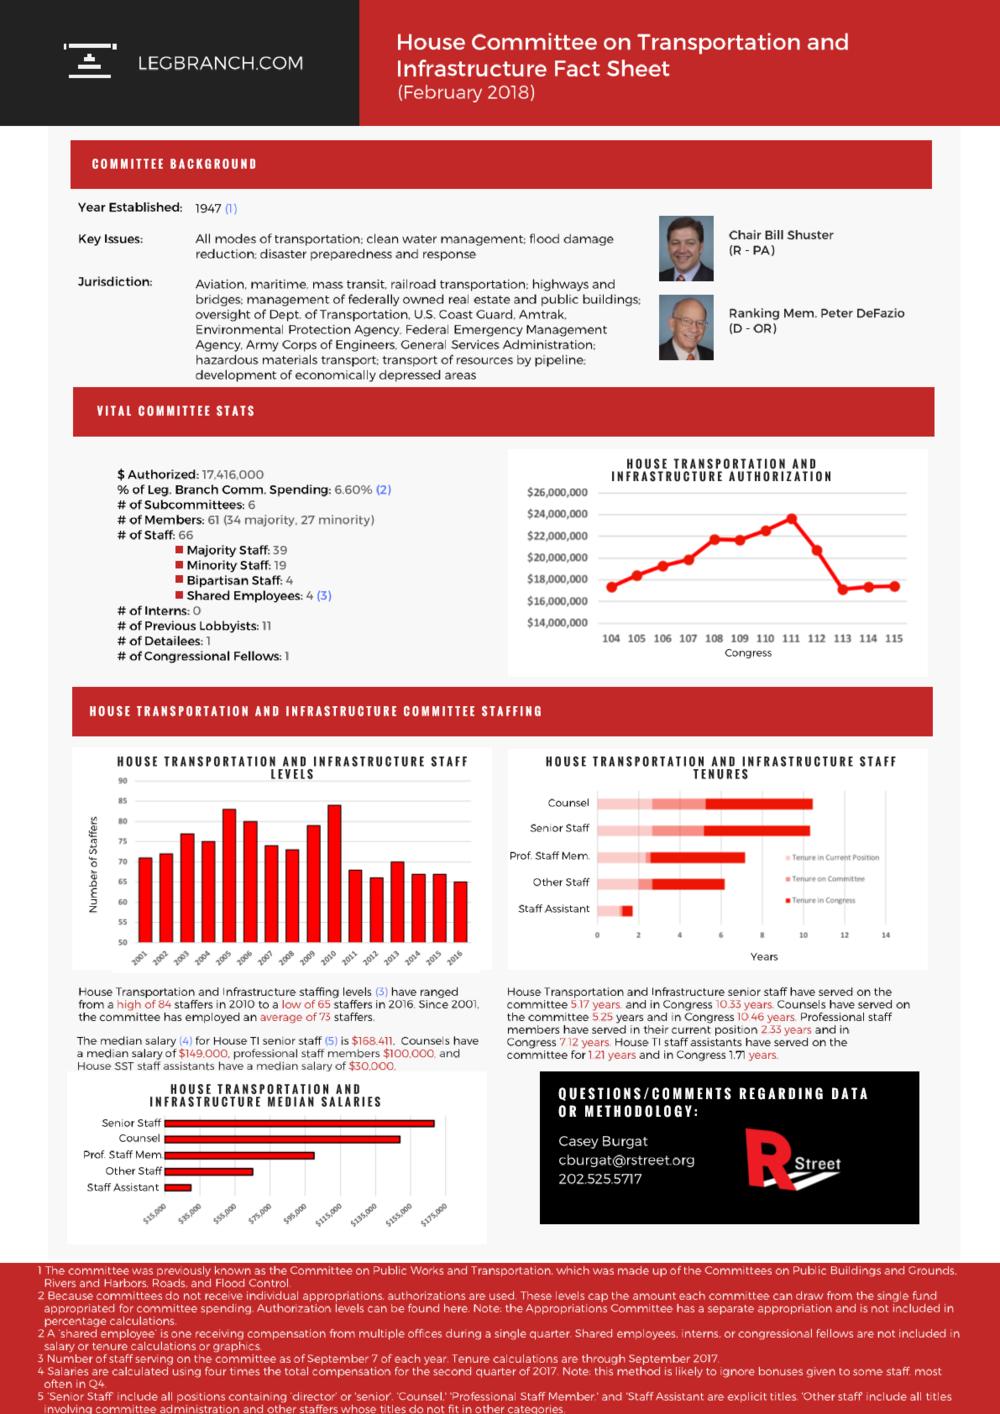 View/download PDF version here